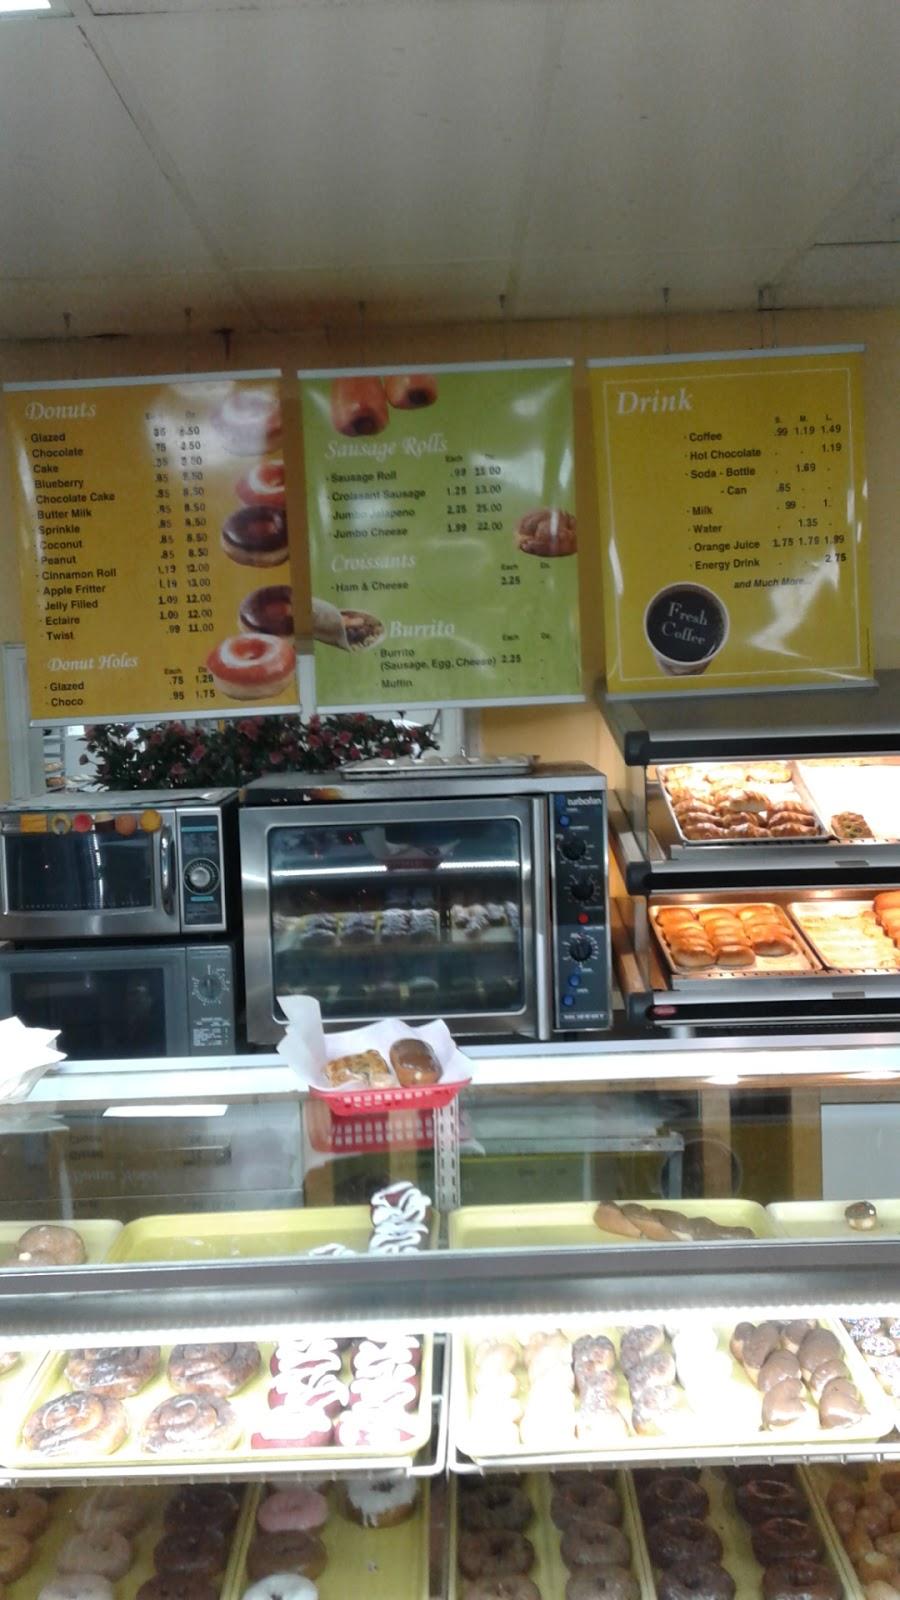 Donuts Plus - bakery    Photo 3 of 10   Address: 2201 Jacksboro Hwy Ste 109, Fort Worth, TX 76114, USA   Phone: (817) 624-4502